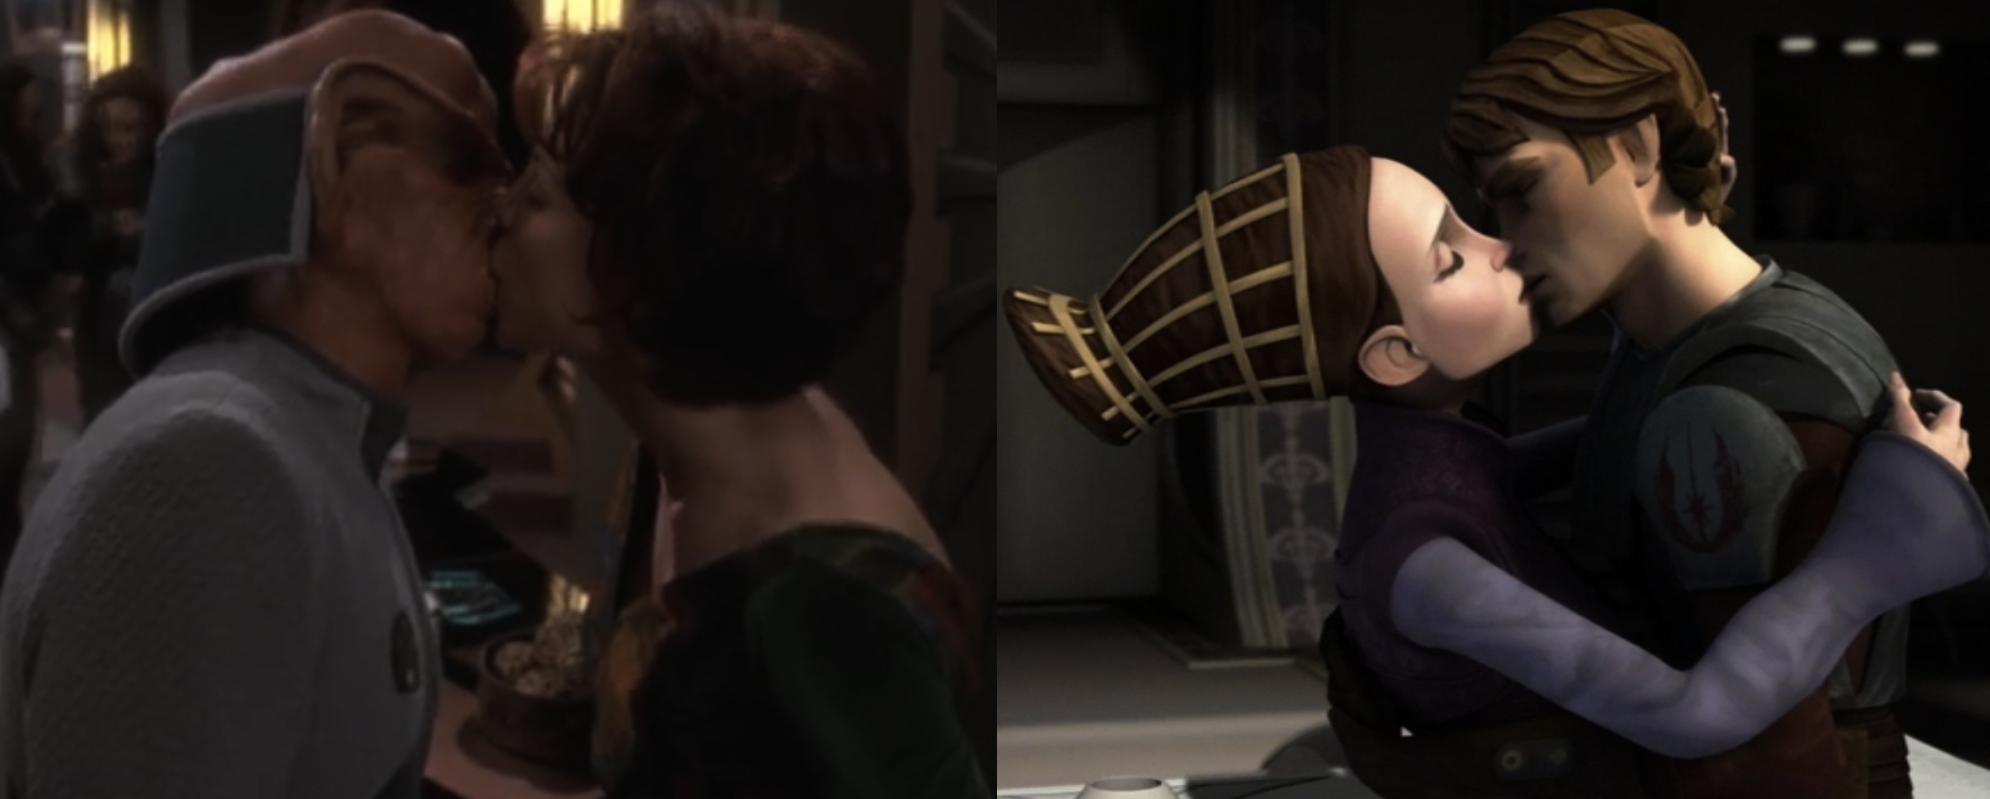 Star Trek's Leeta and Rom, Star Wars's Padme and Anakin